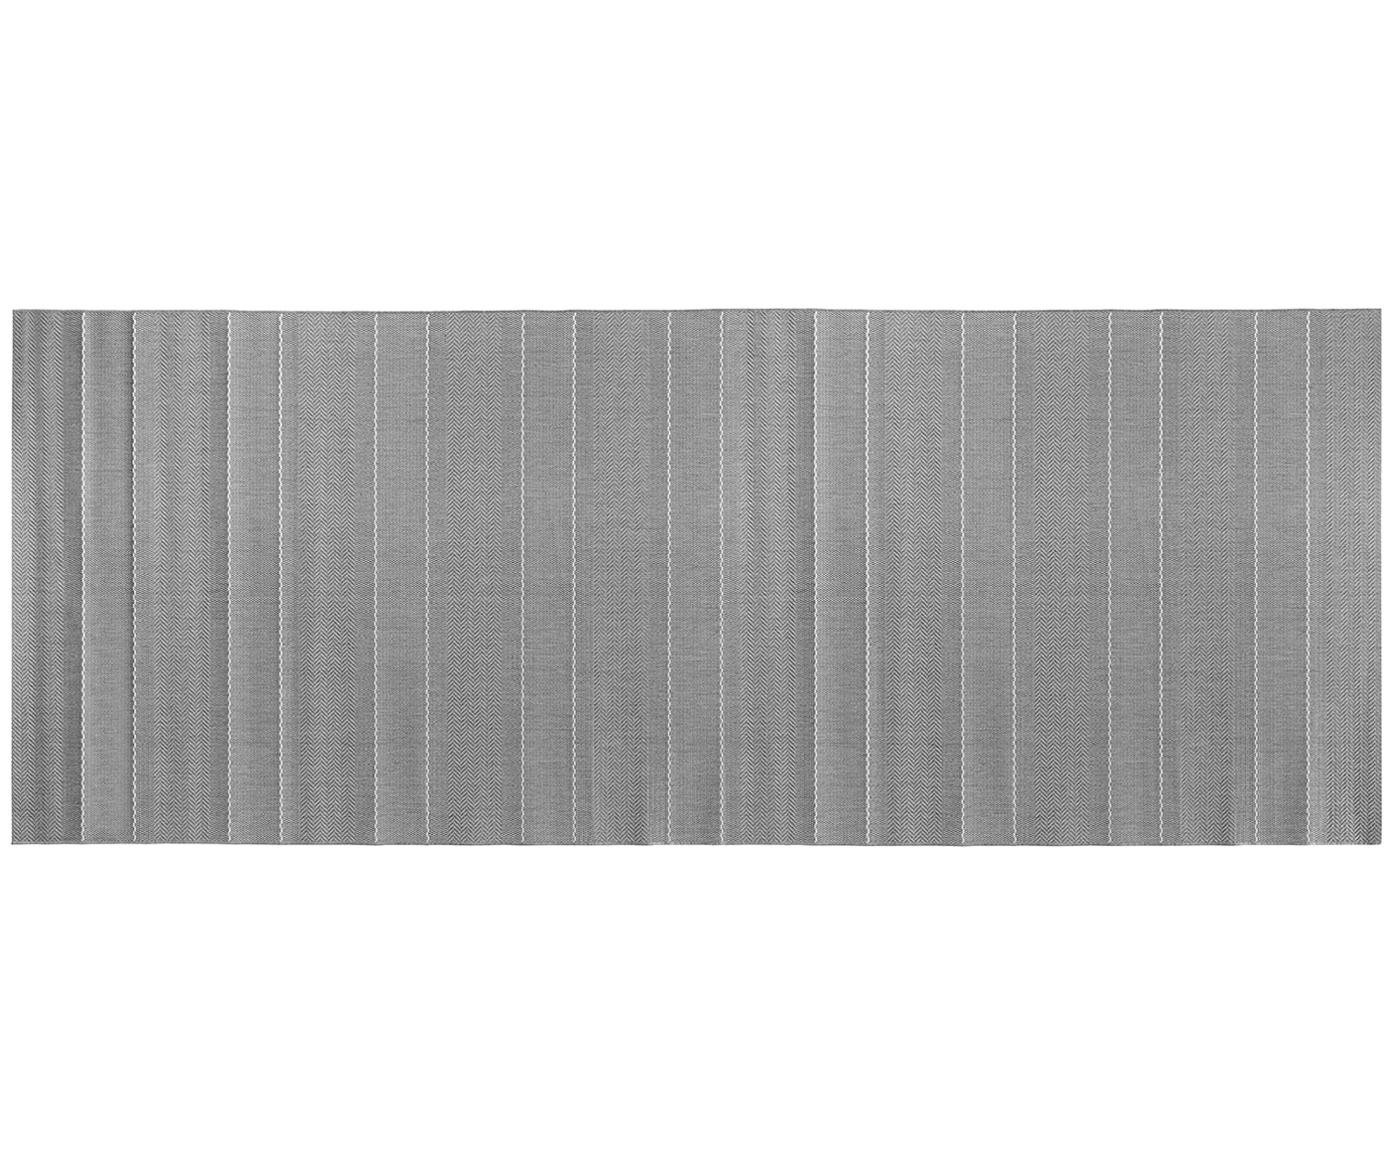 Alfombra de interior/exterior Sunshine, Gris, beige, An 80 x L 200 cm